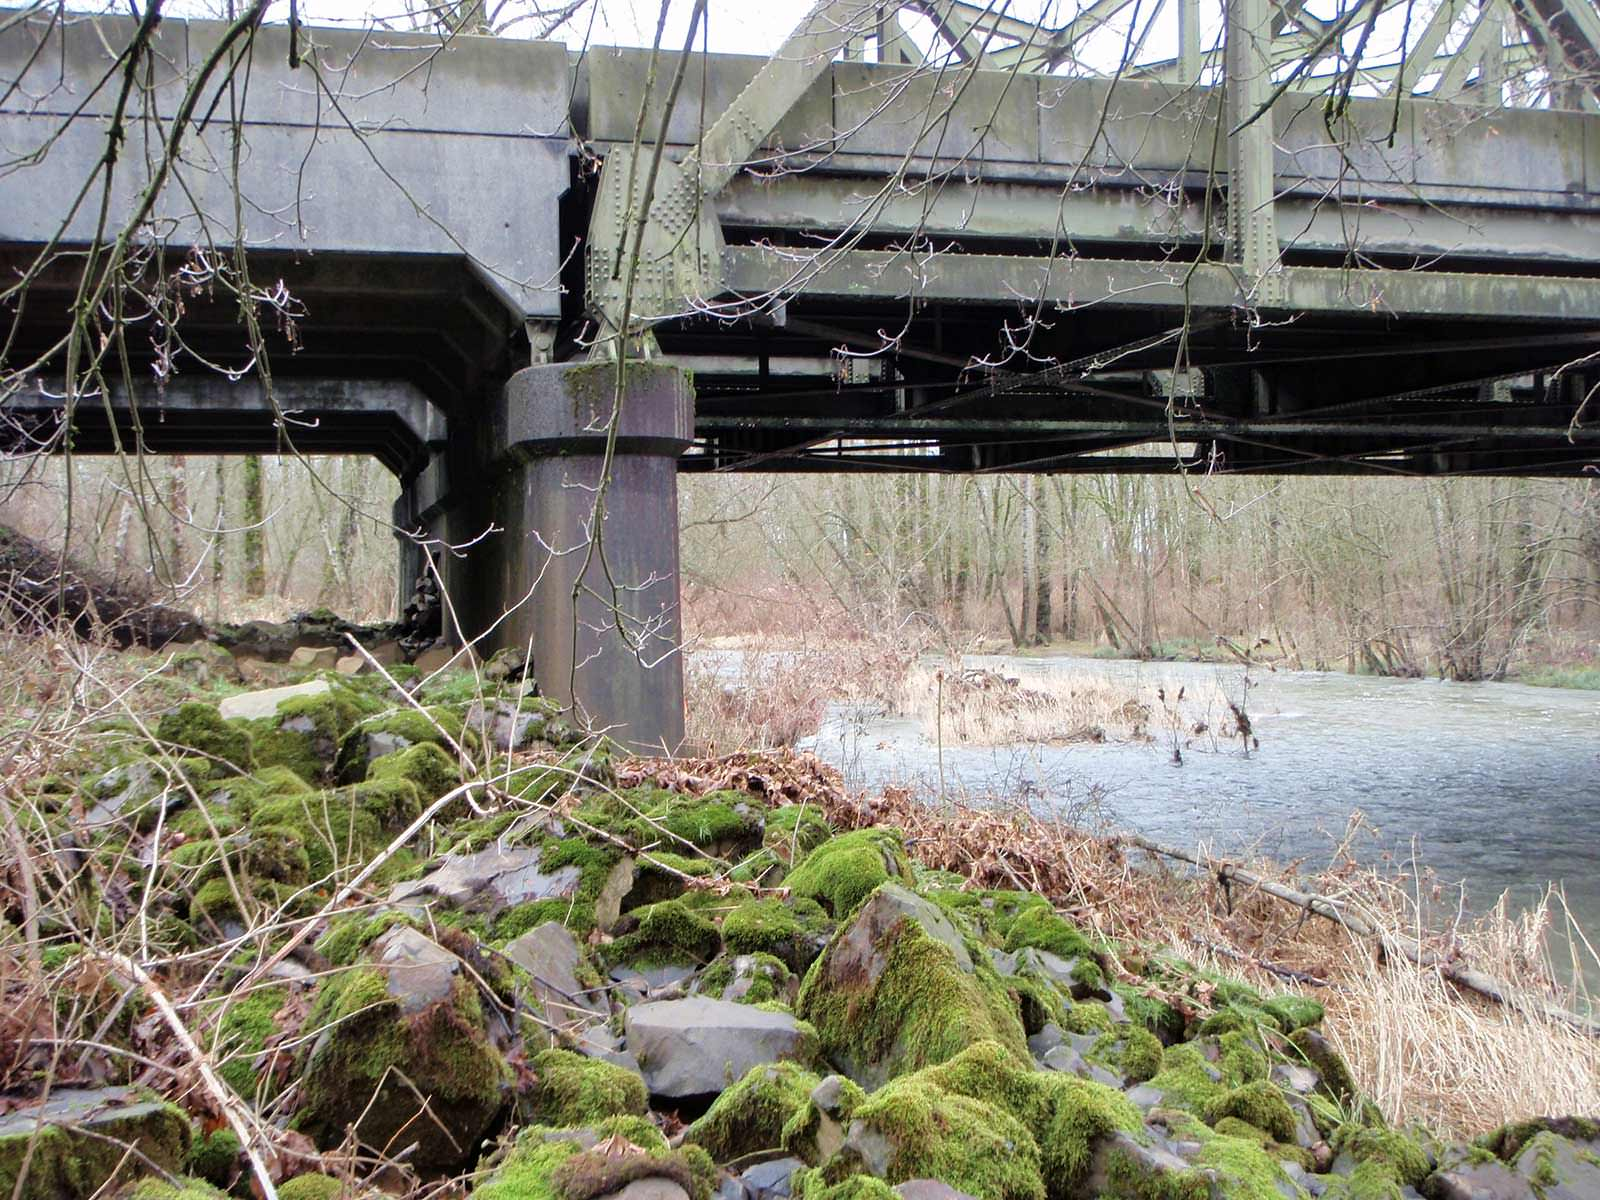 I-5 Mellen to Blakeslee Riparian Upstream